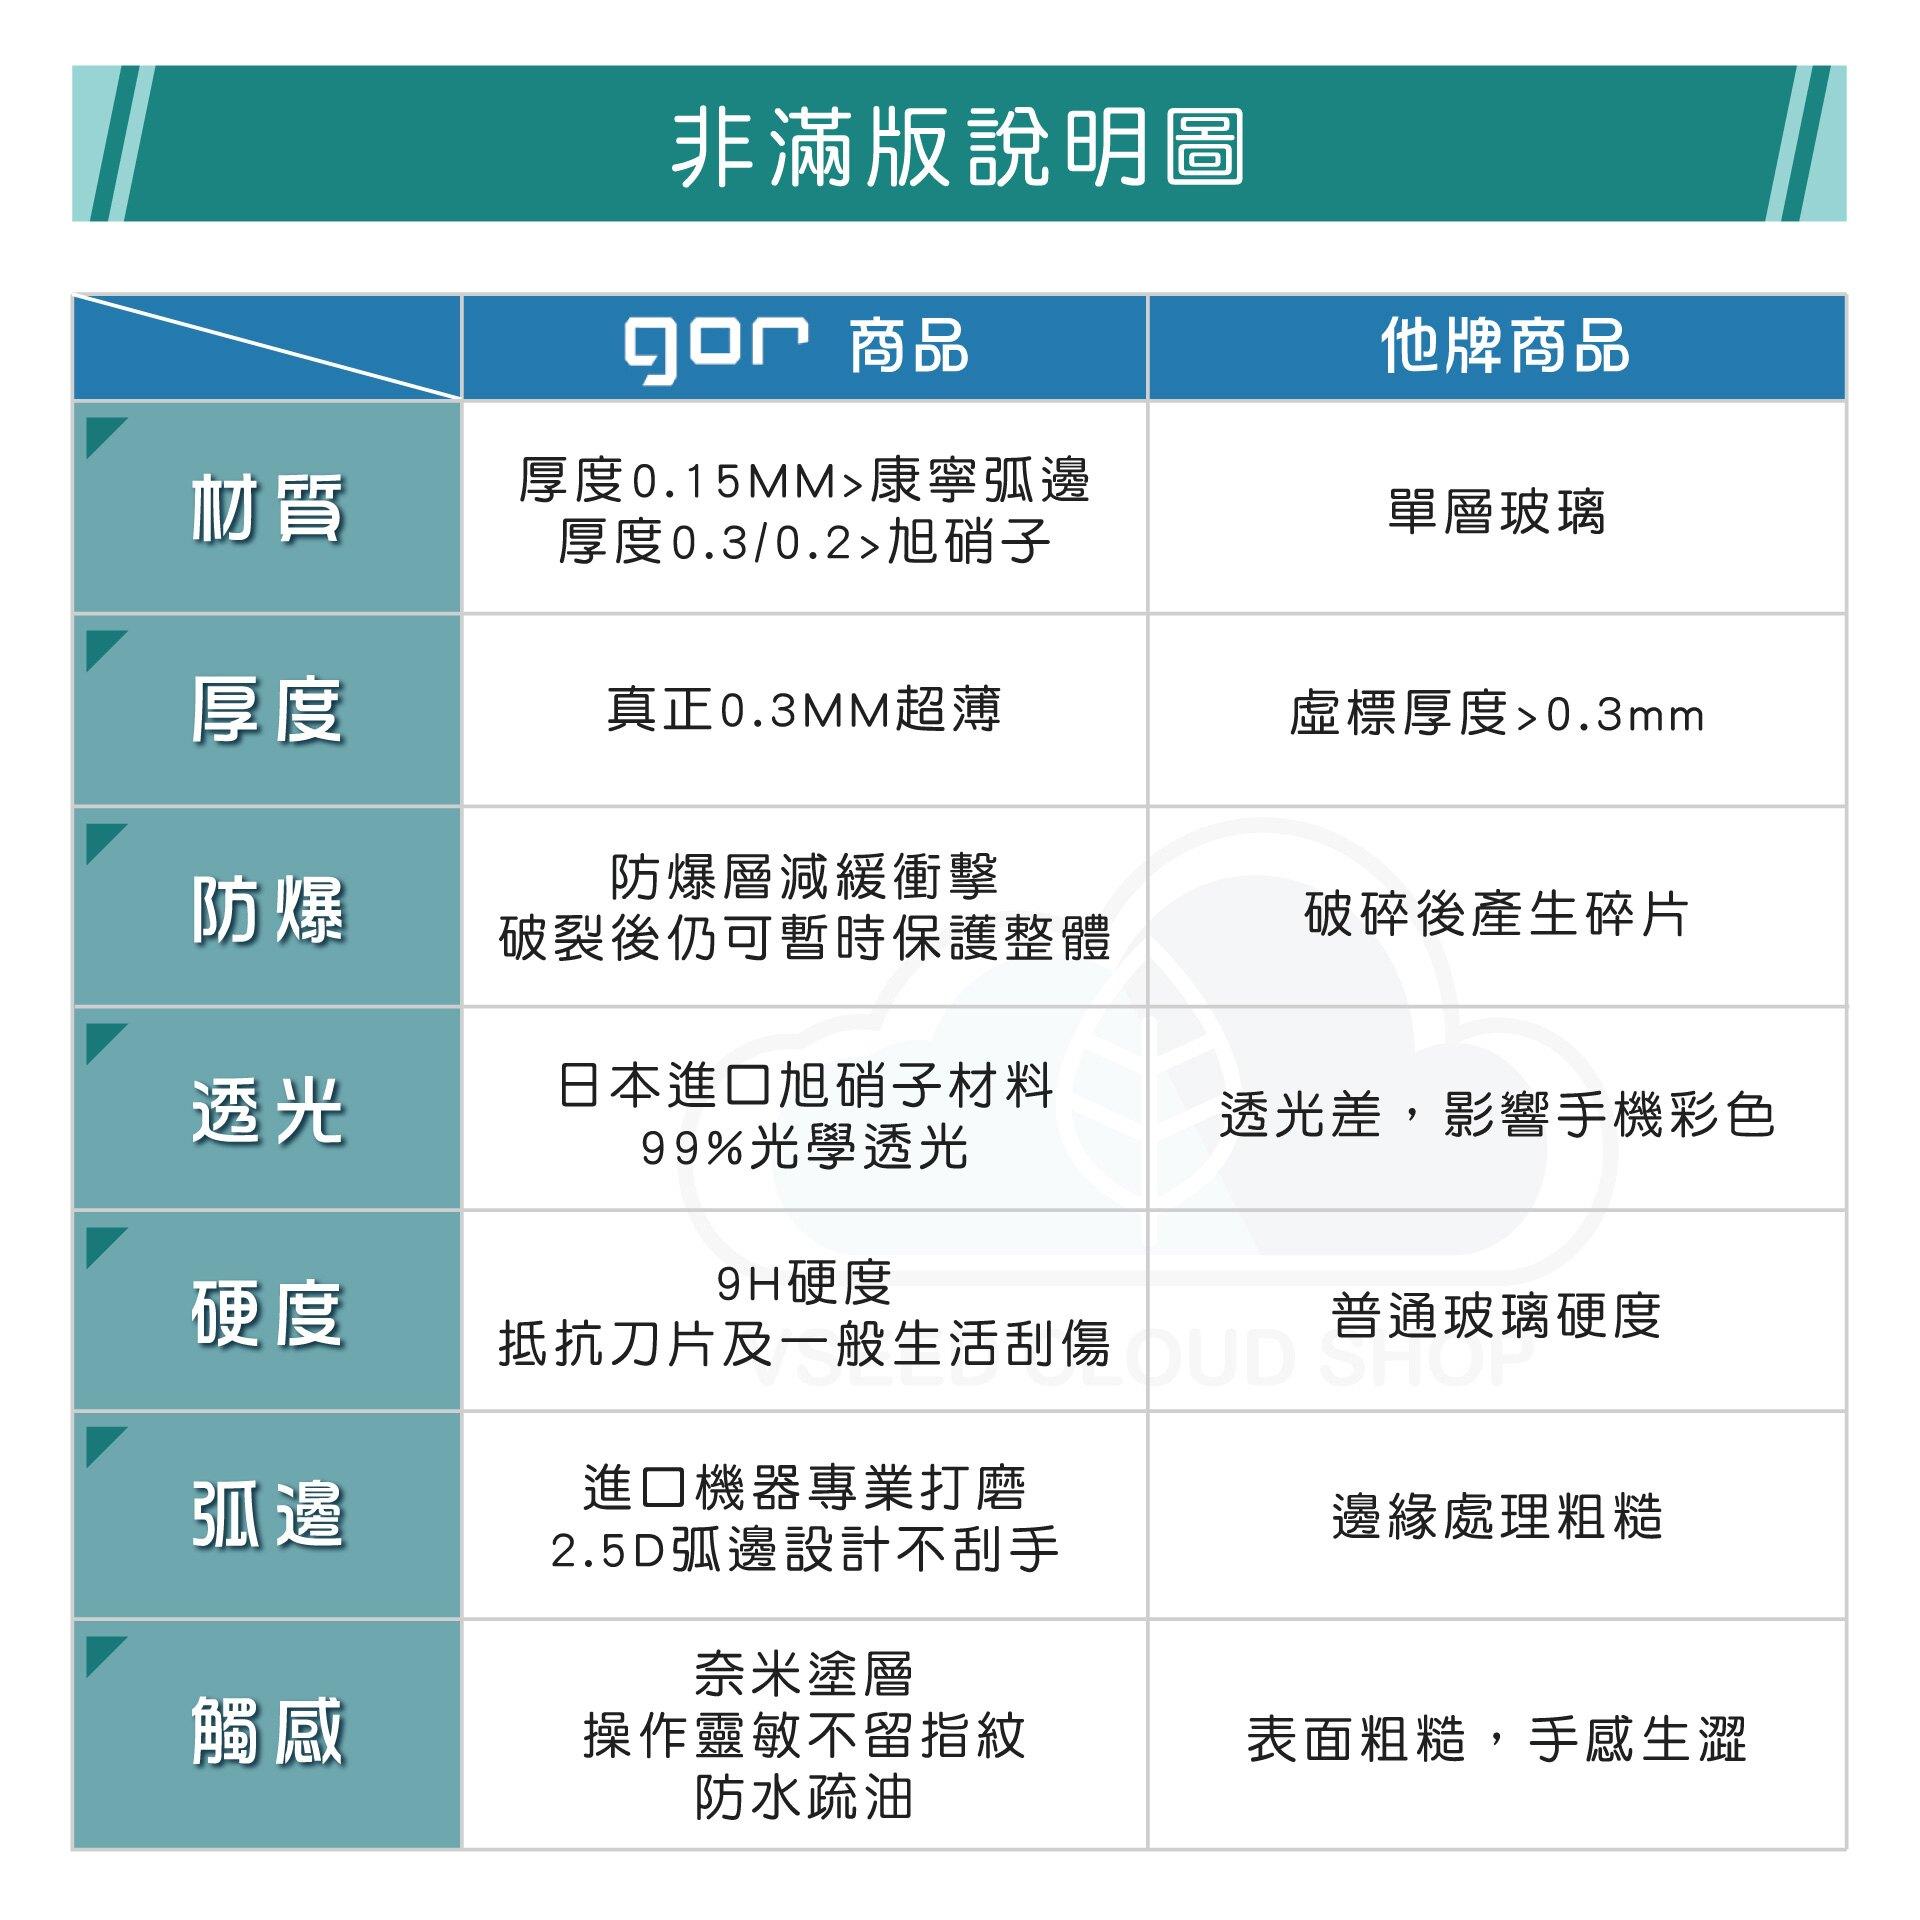 GOR 9H LG G4 鋼化 玻璃 保護貼 全透明非滿版 兩片裝【全館滿299免運費】